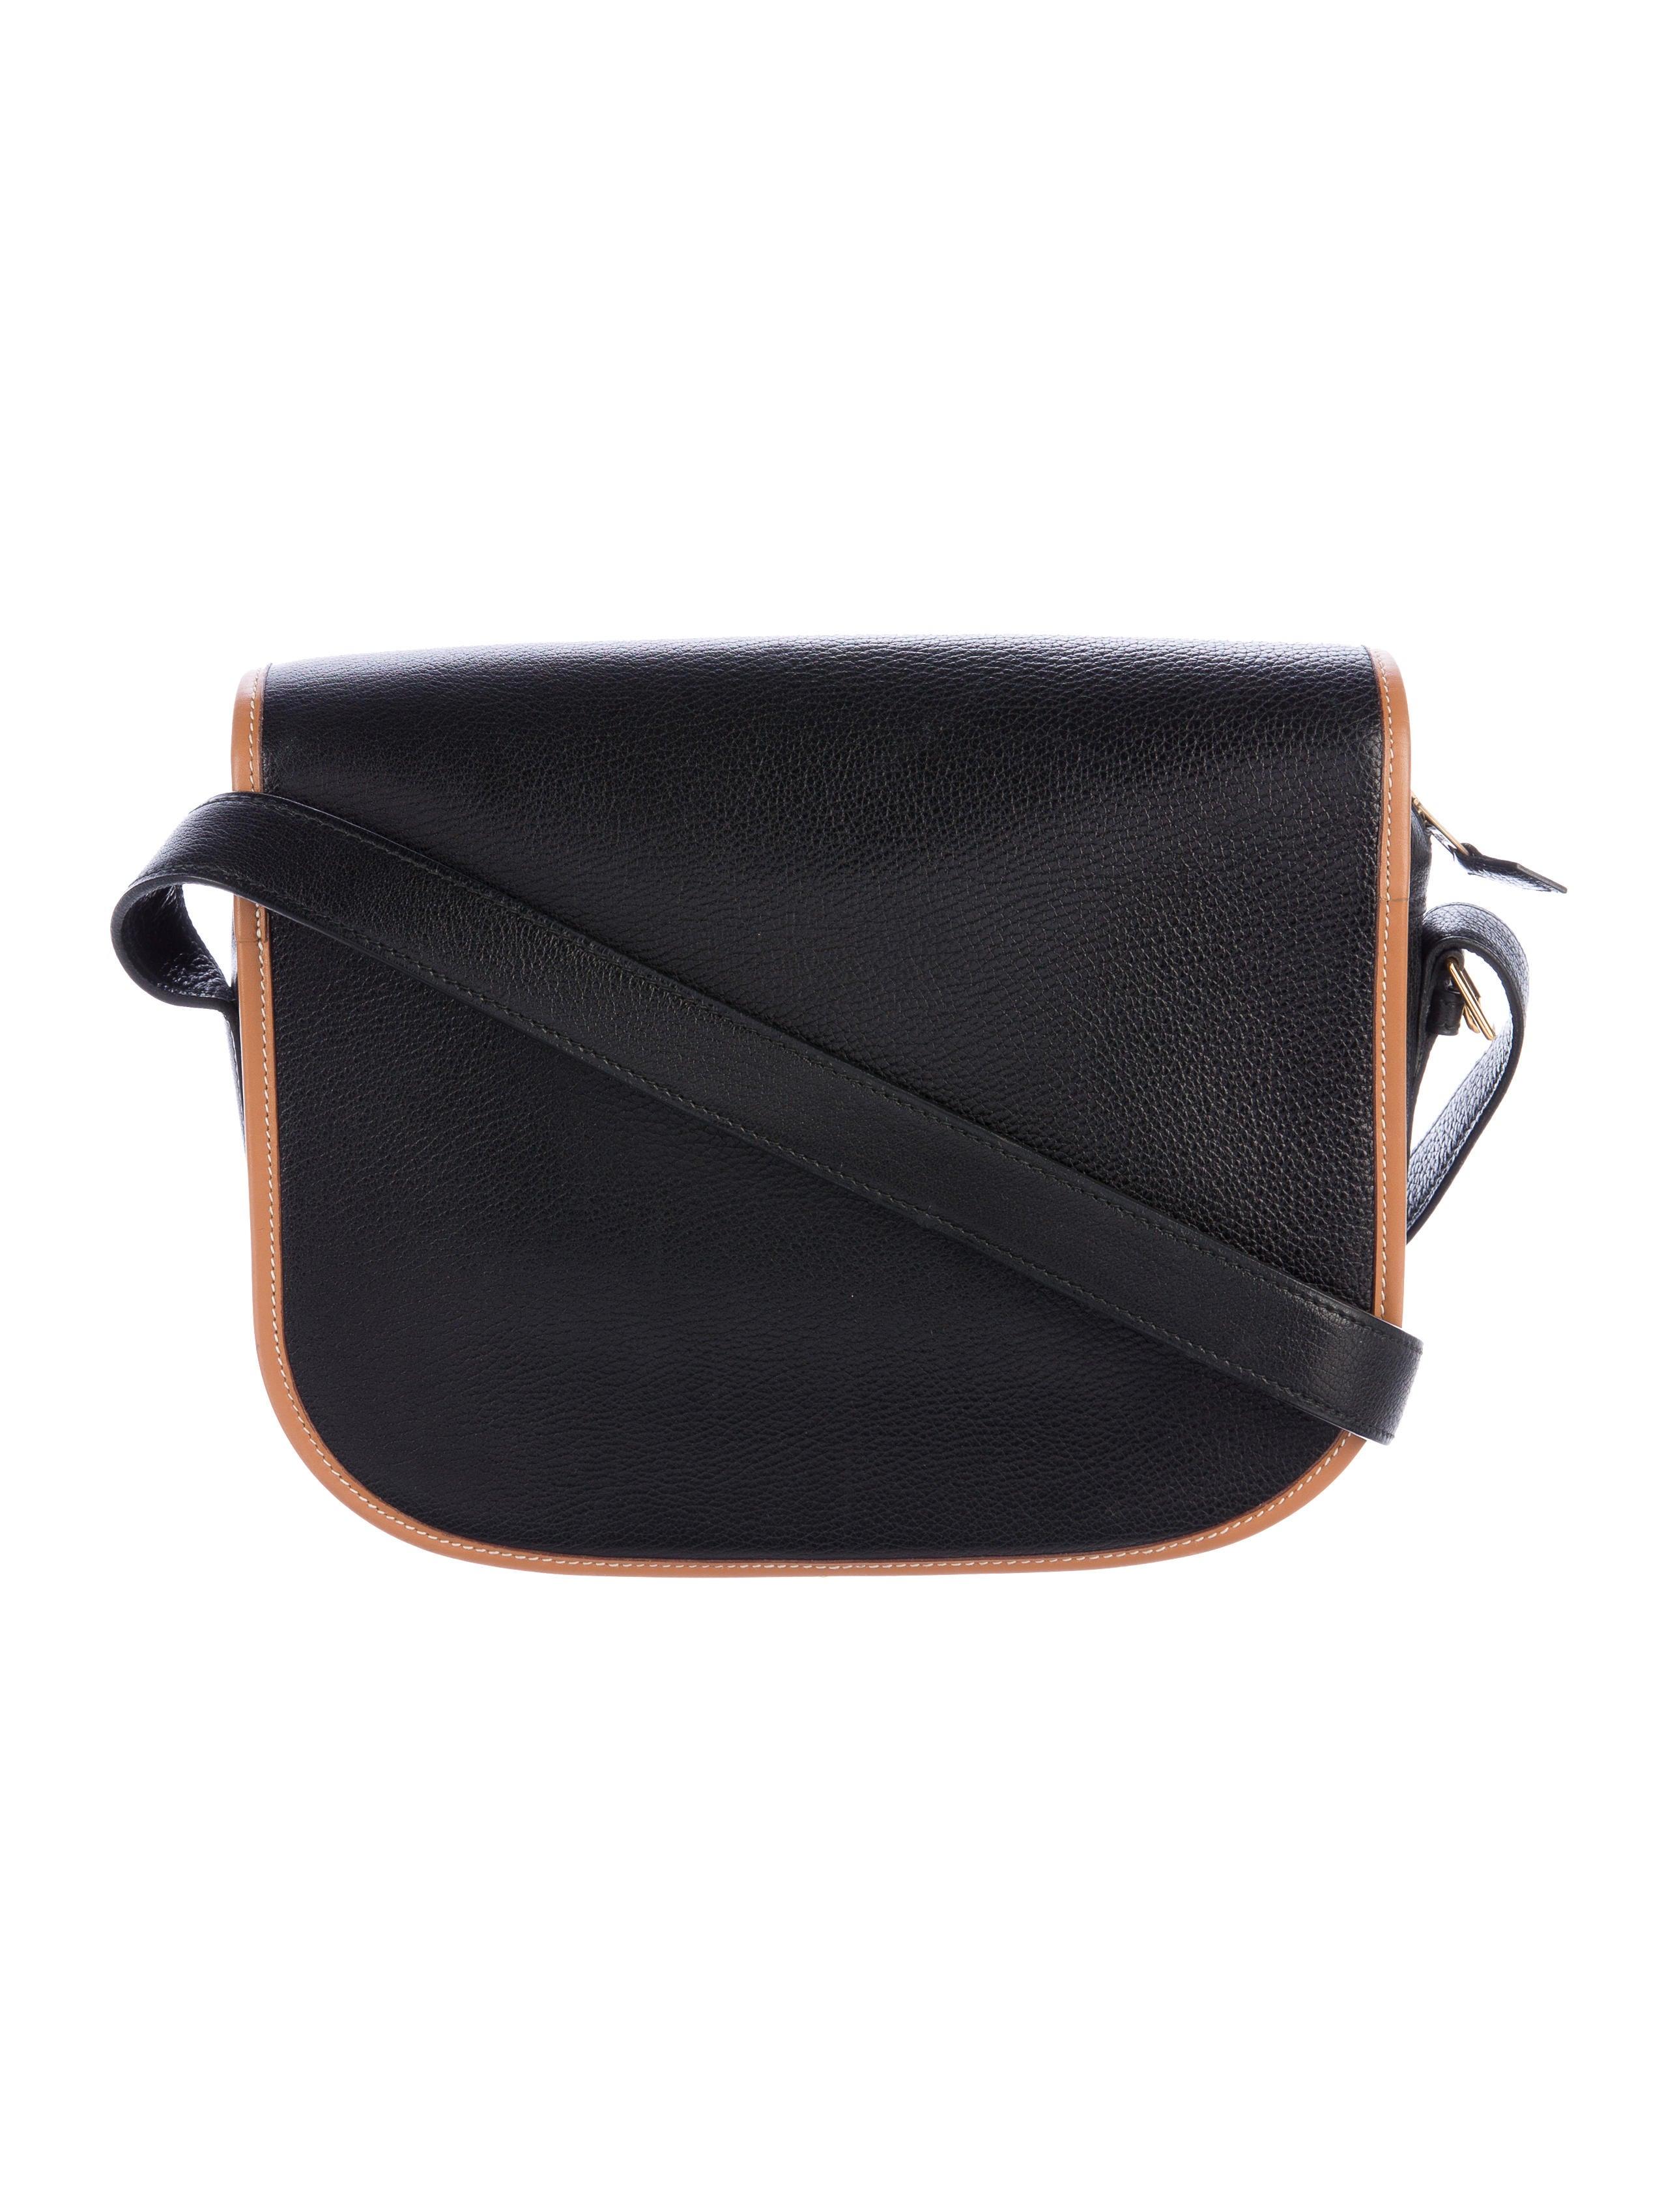 herm s balle de golf bag handbags her102522 the realreal. Black Bedroom Furniture Sets. Home Design Ideas